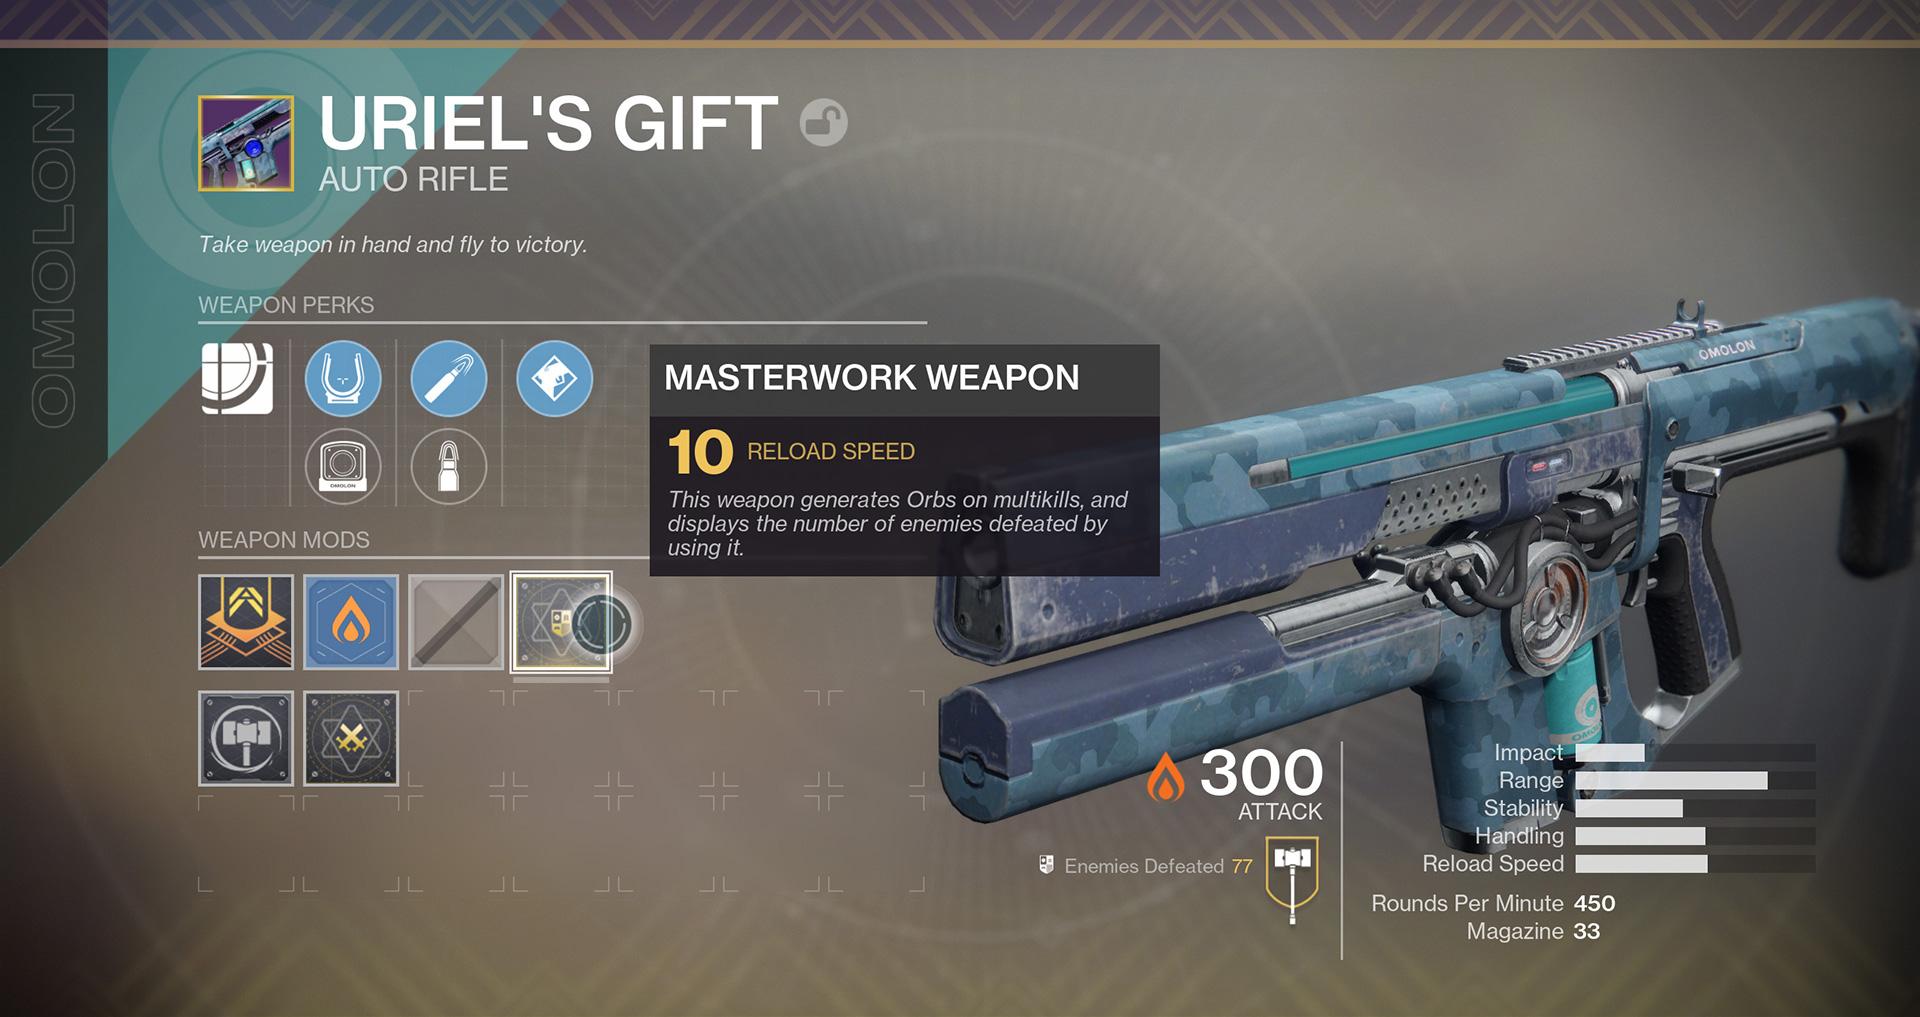 Destiny 2 - Masterwork version of Uriel's Gift